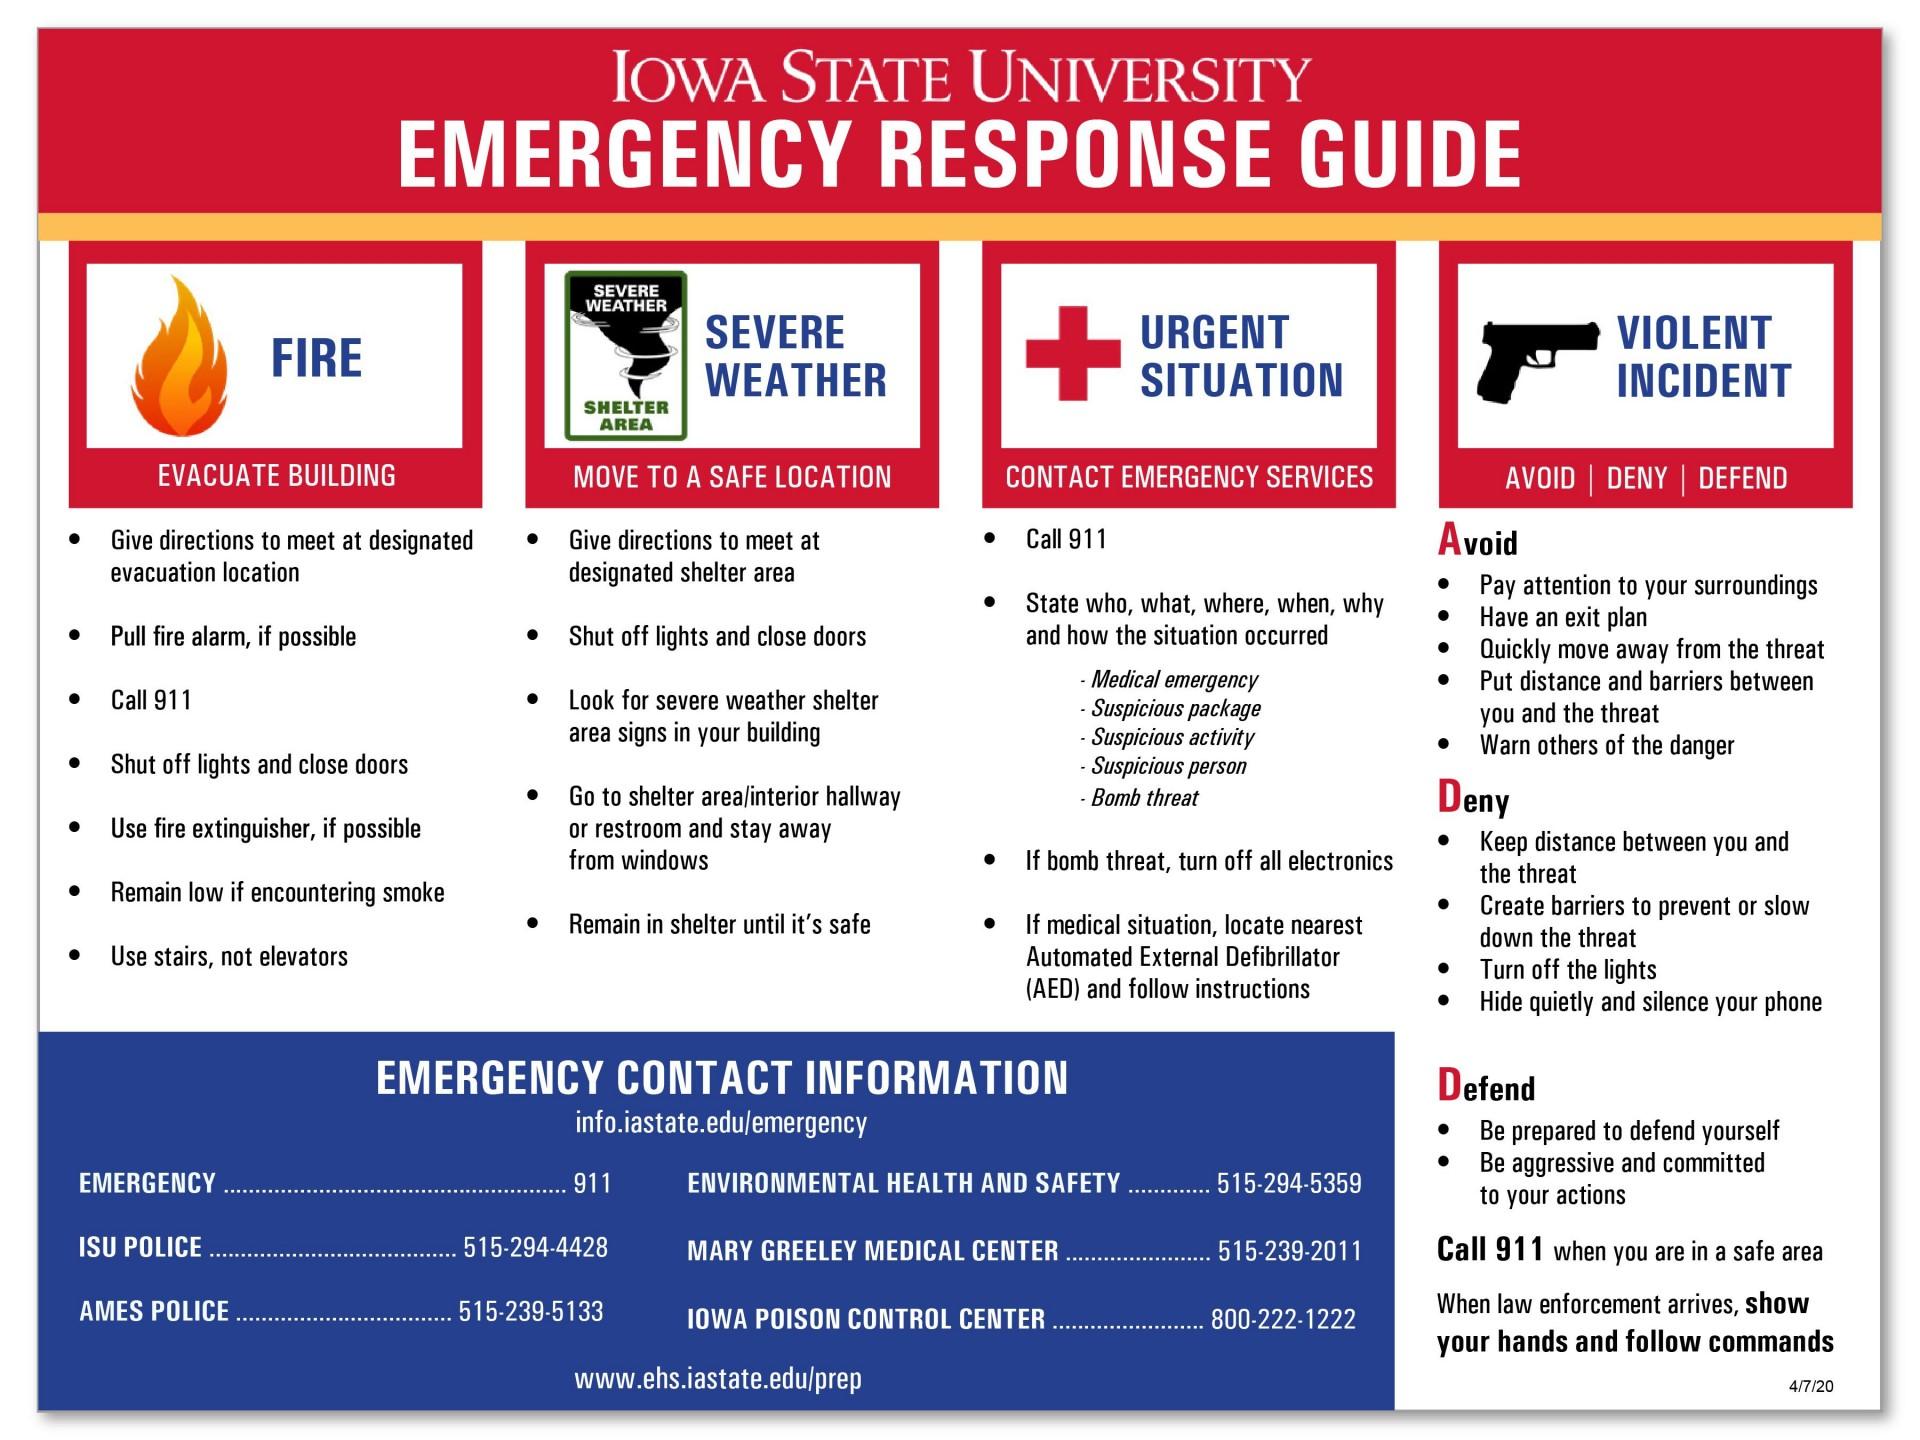 006 Simple Emergency Operation Plan Template High Resolution  For Churche Fema Basic1920